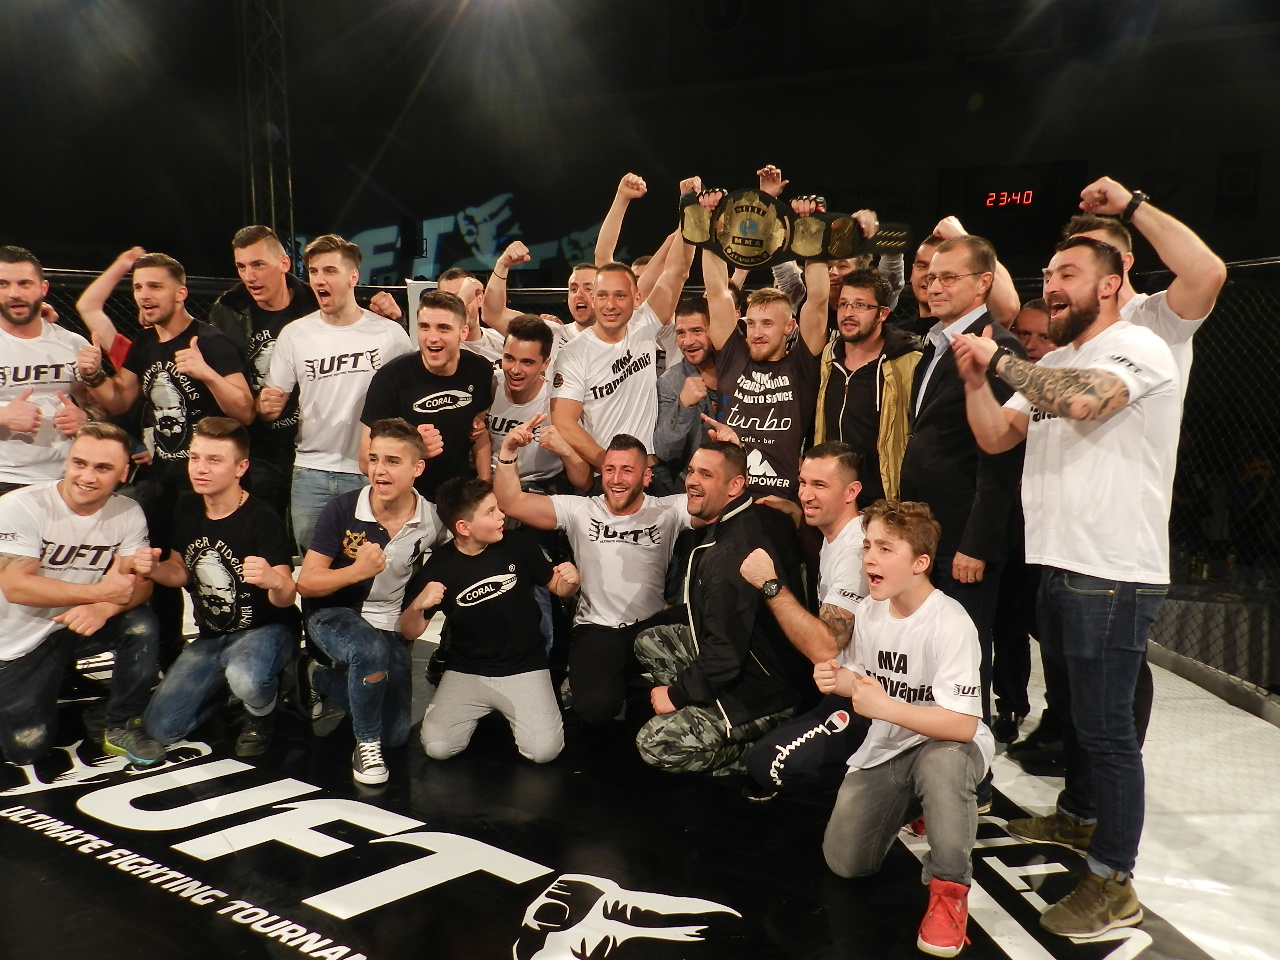 Maris Ciprian MMA Transilvania, castigator centura mondiala MMA la Gala UFT Cluj 15 aprilie 2016